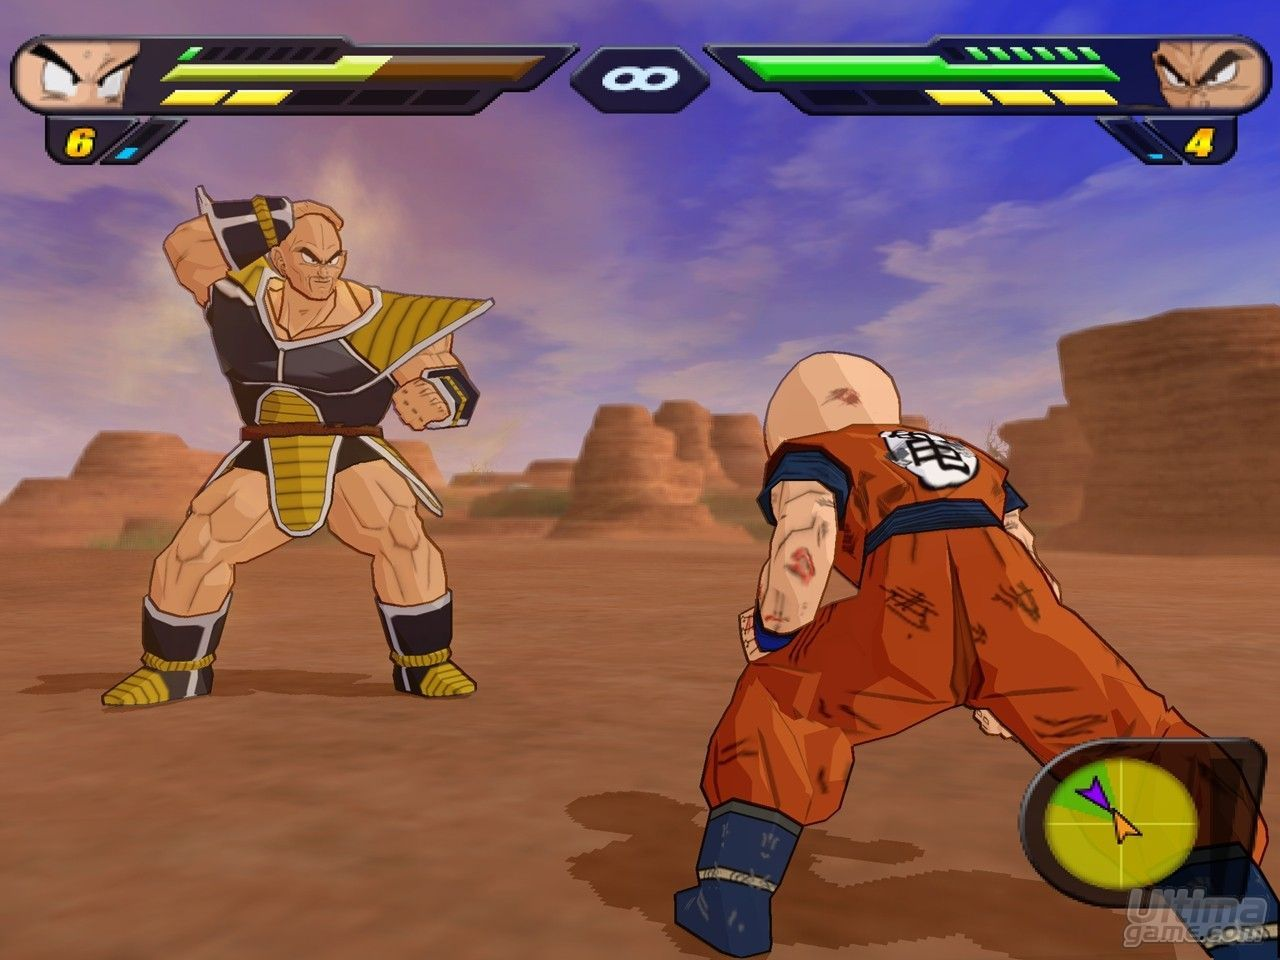 de Dragon Ball Z Budokai Tenkaichi 2: Budokai Tenkaichi 2 para Wii